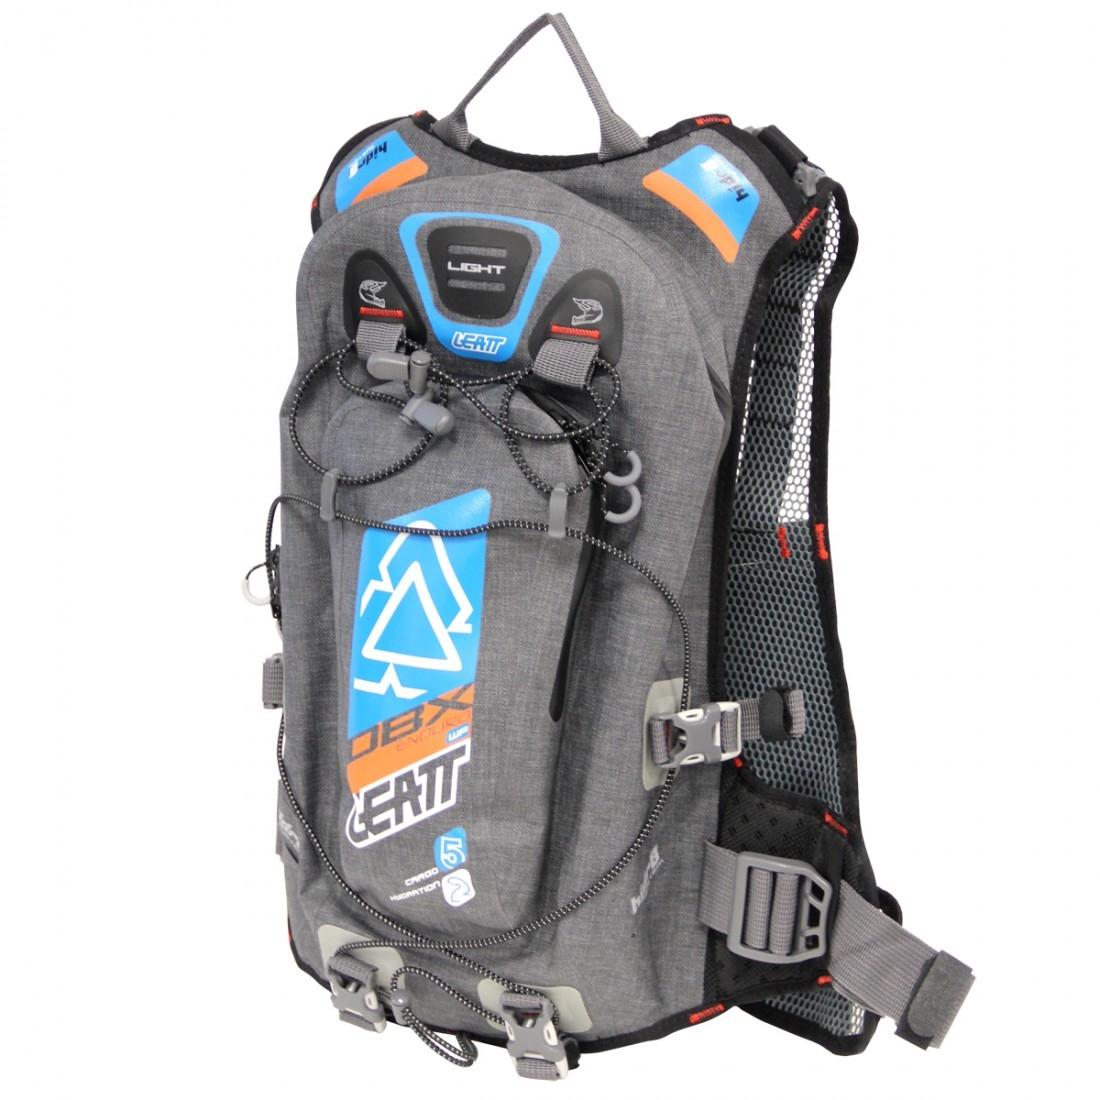 715748a66b LEATT Hydration Pack DBX Enduro Lite WP 2.0 Bag / Back pack · Motocard